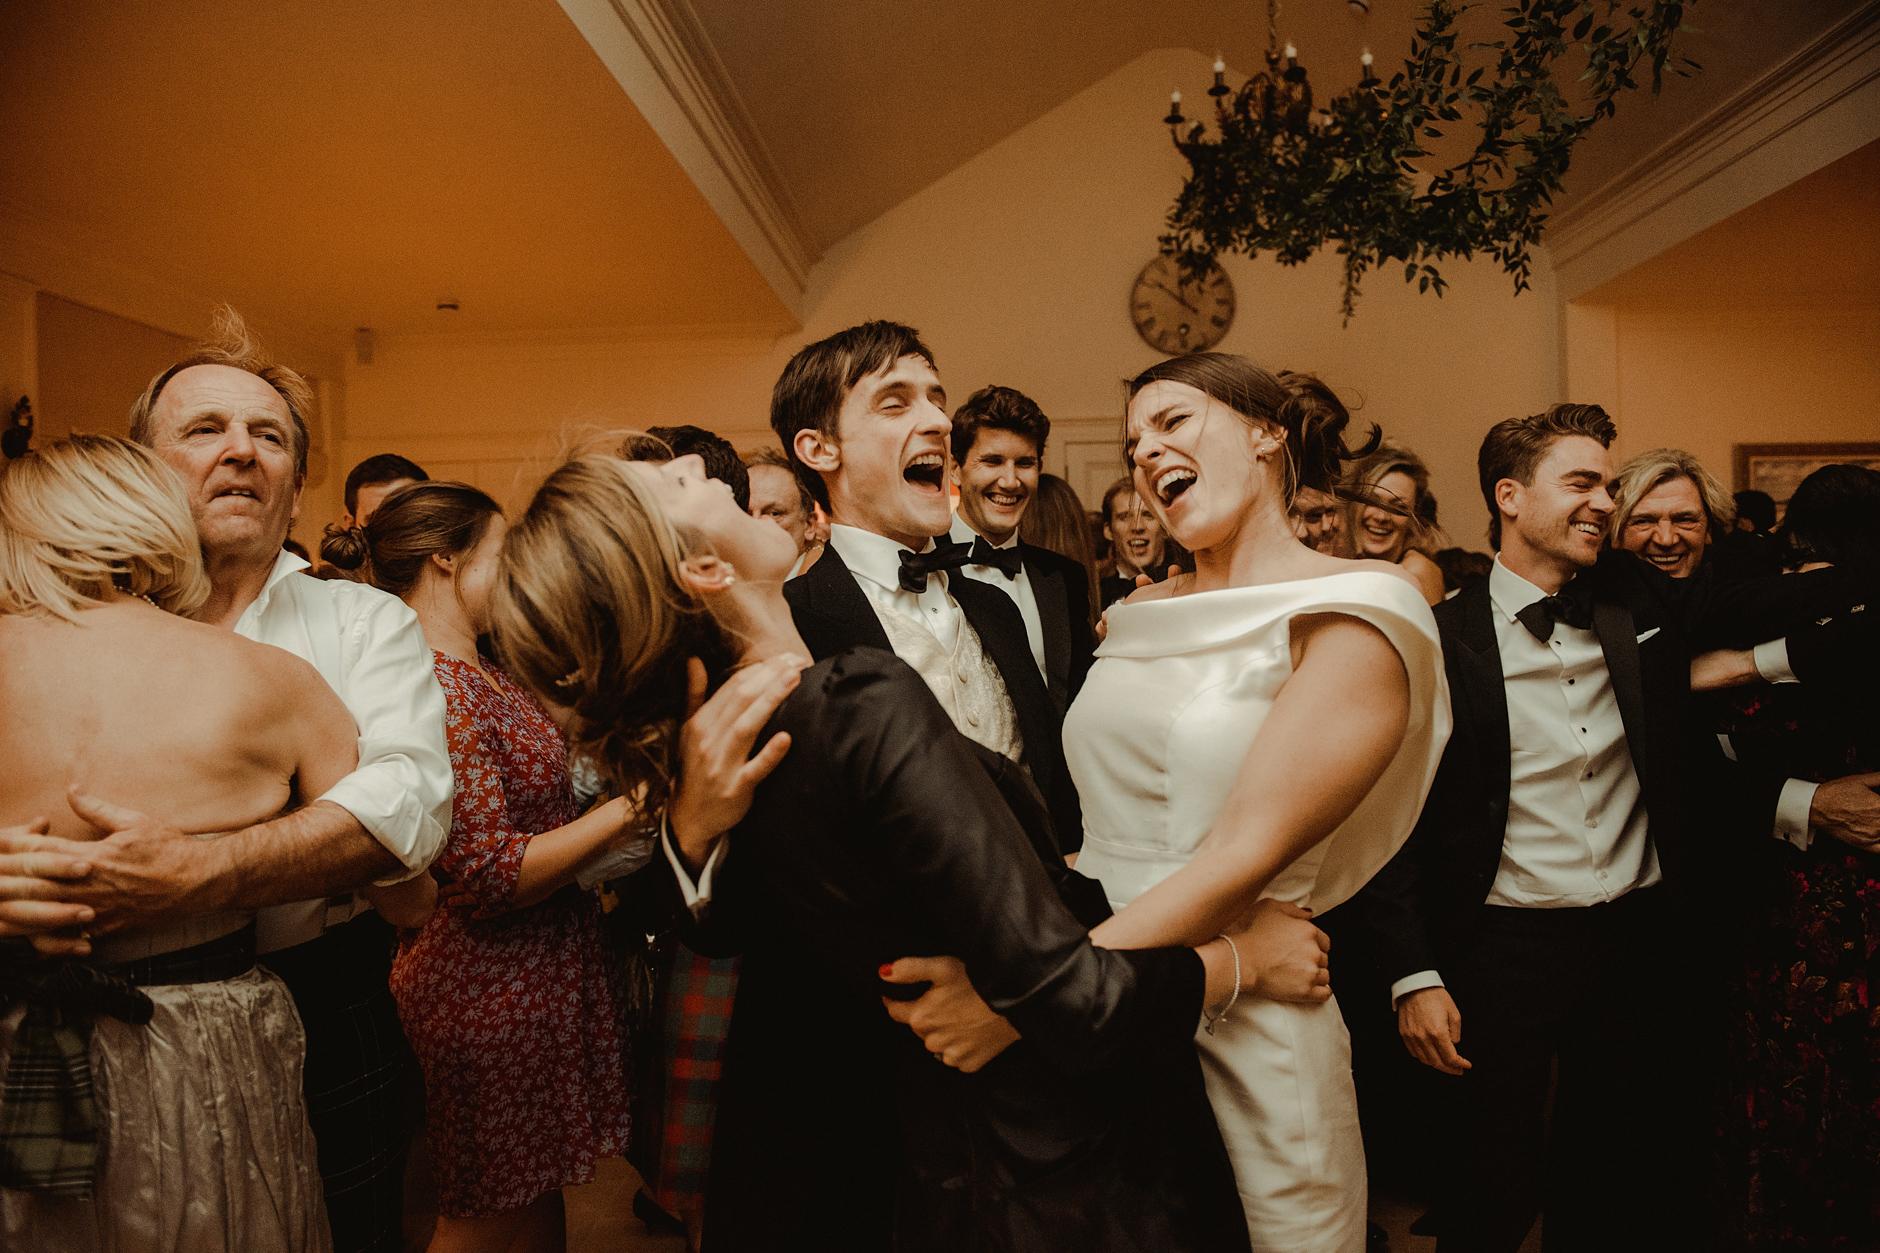 Glentruim-Wedding-Nikki-Leadbetter-Photography-365.jpg